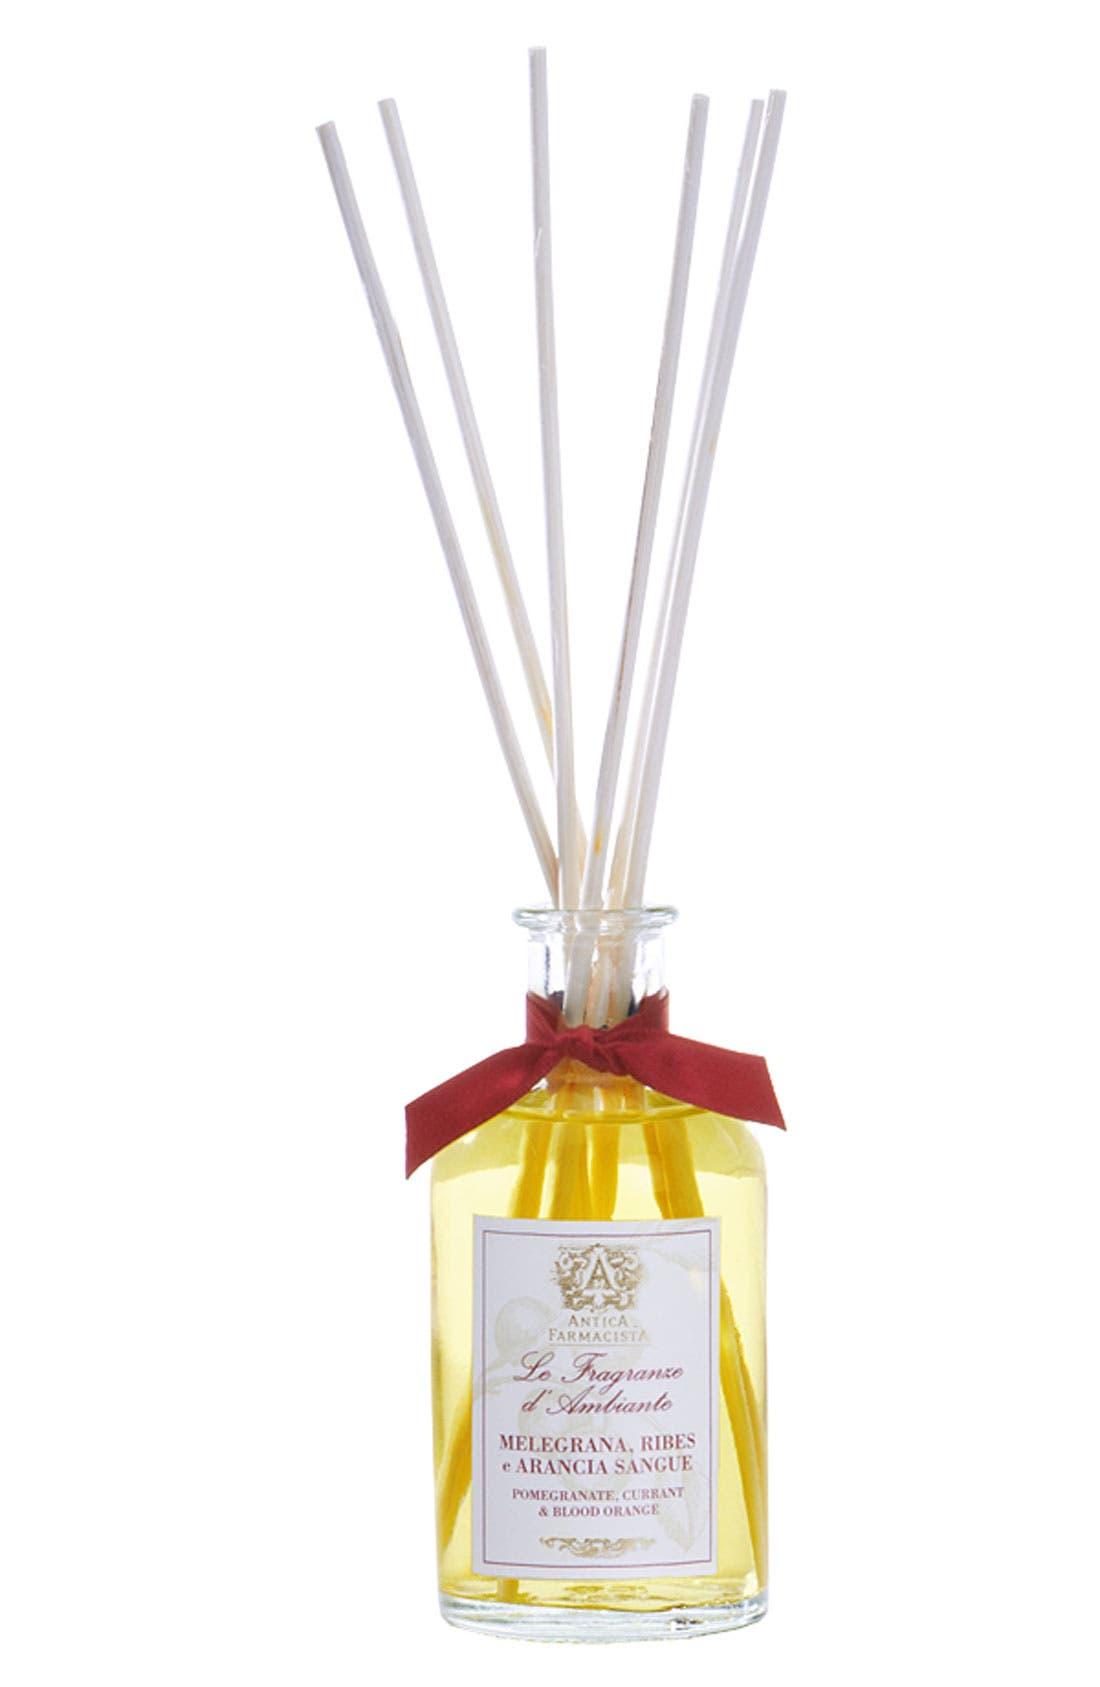 Antica Farmacista Pomegranate, Currant & Blood Orange Home Ambiance Perfume (3.3 oz.)